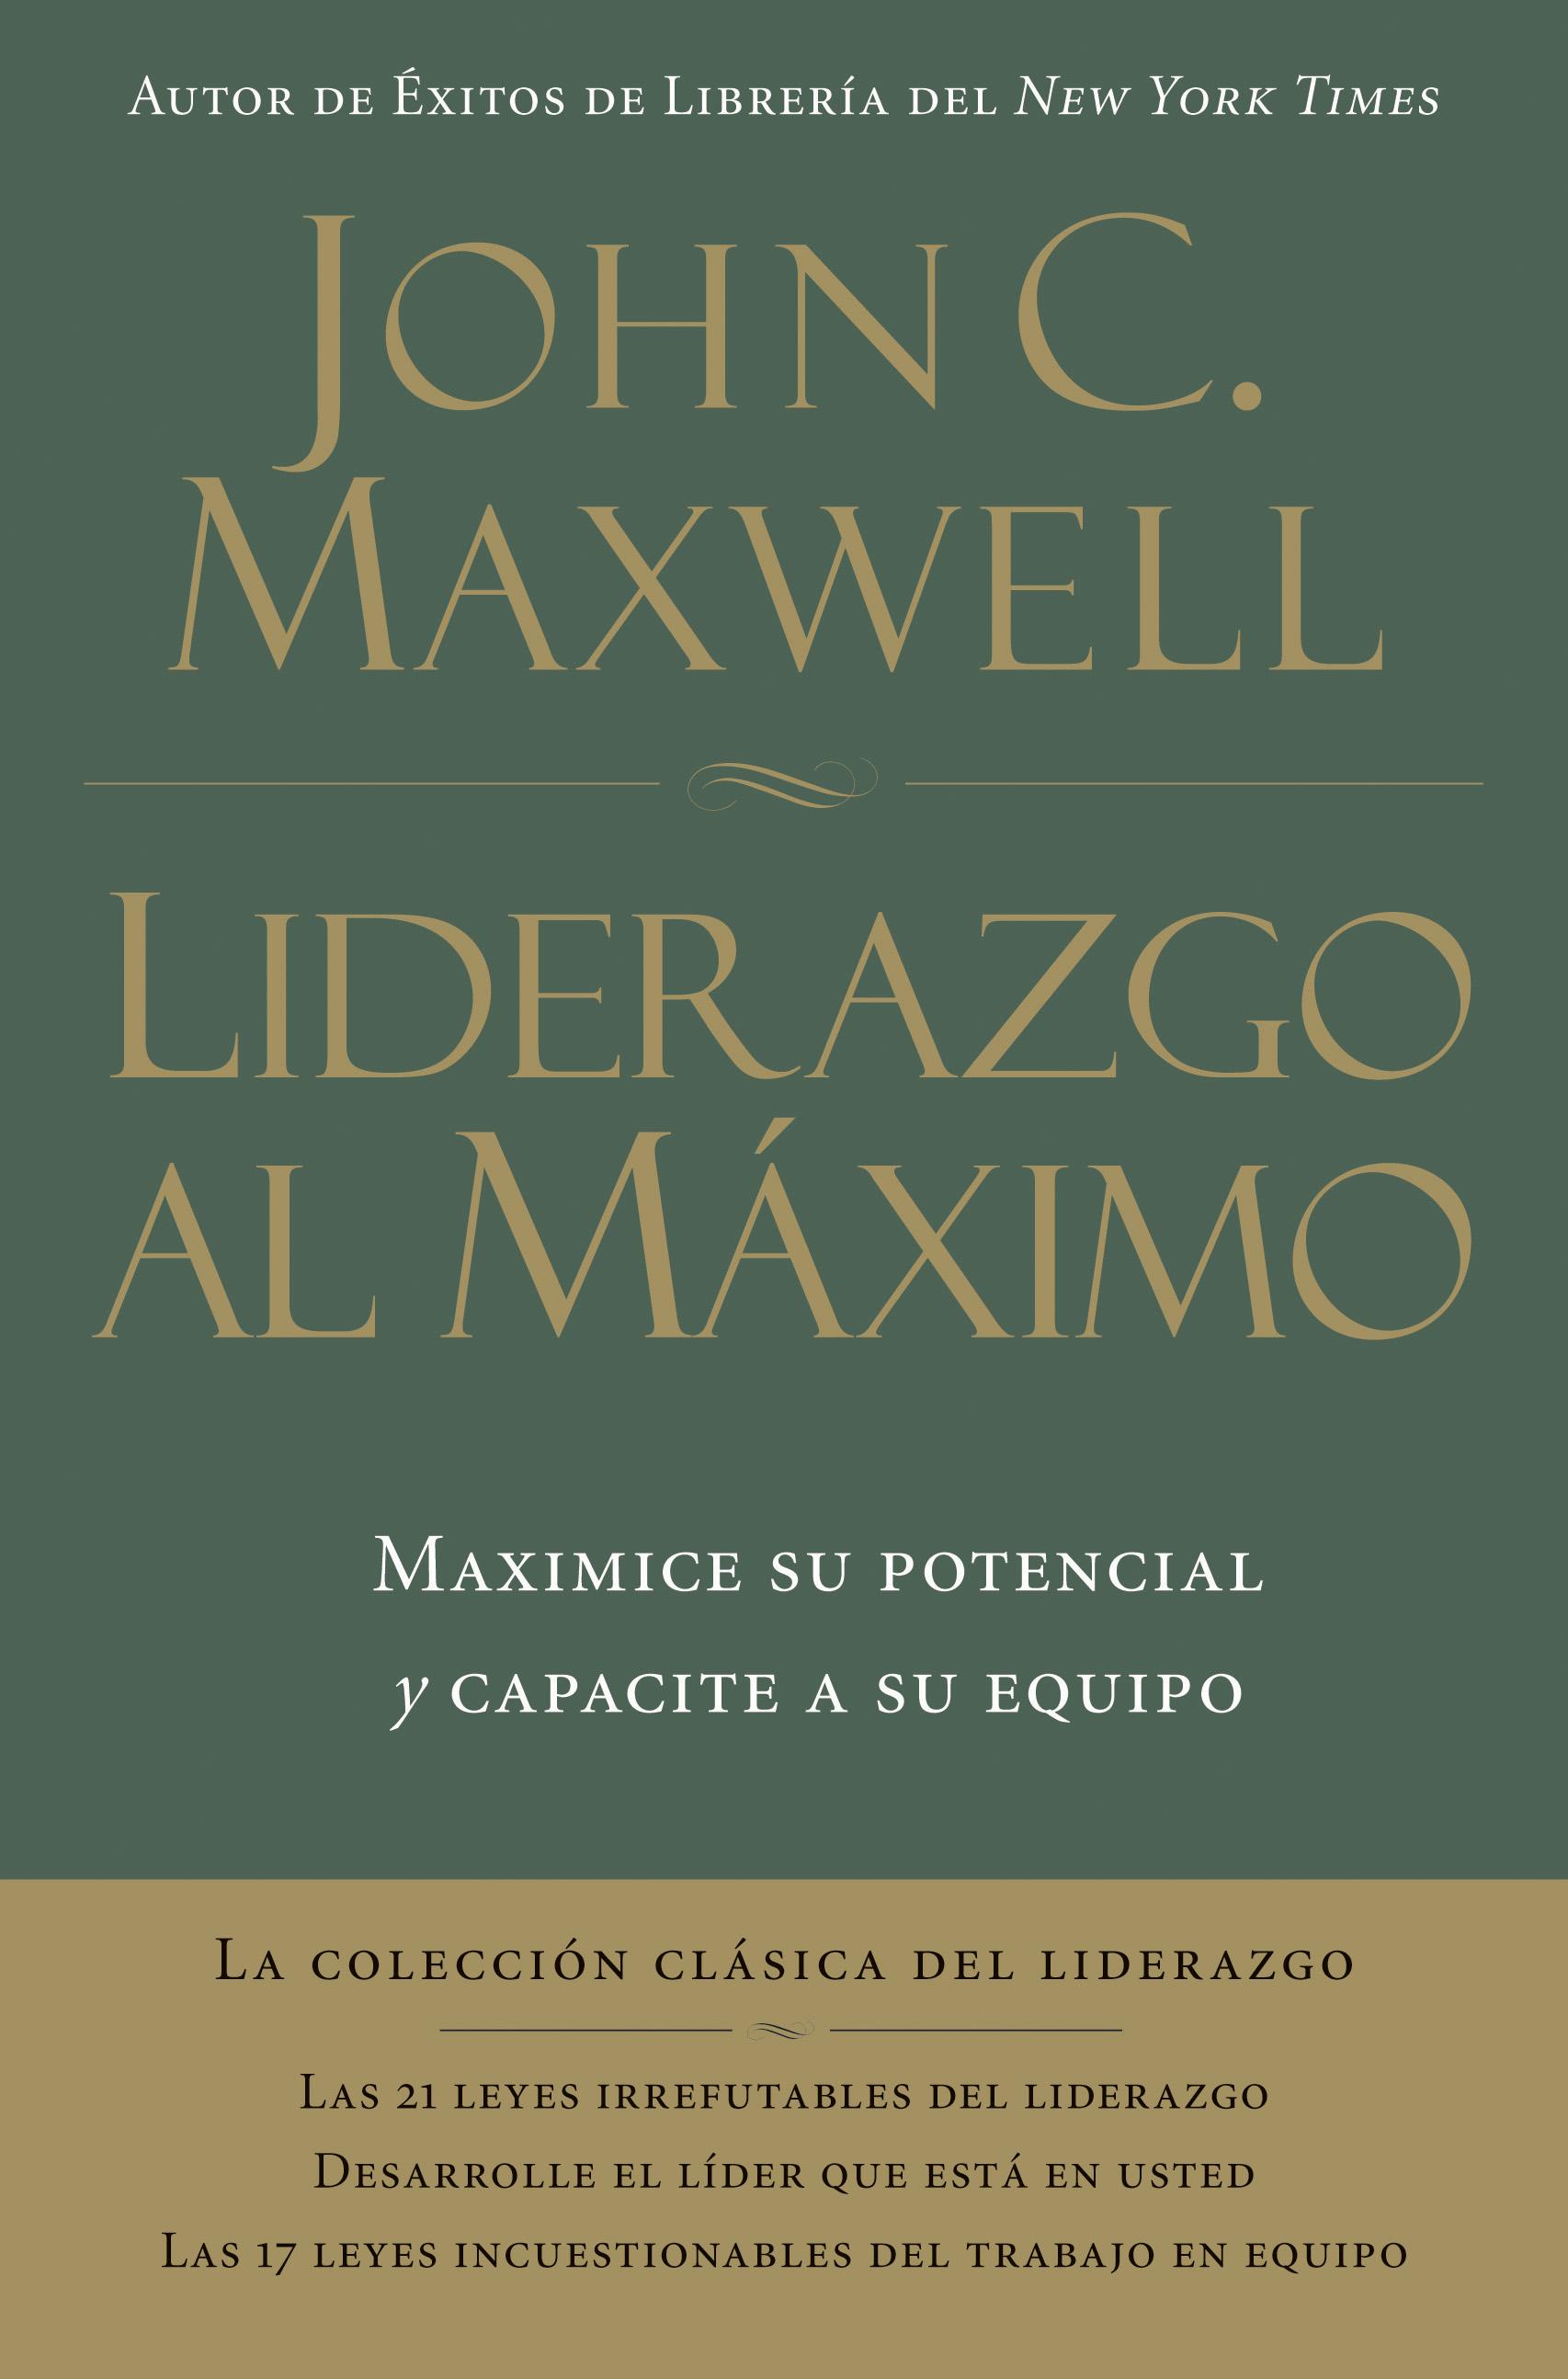 Lea Liderazgo Al Máximo De John C Maxwell En Línea Libros